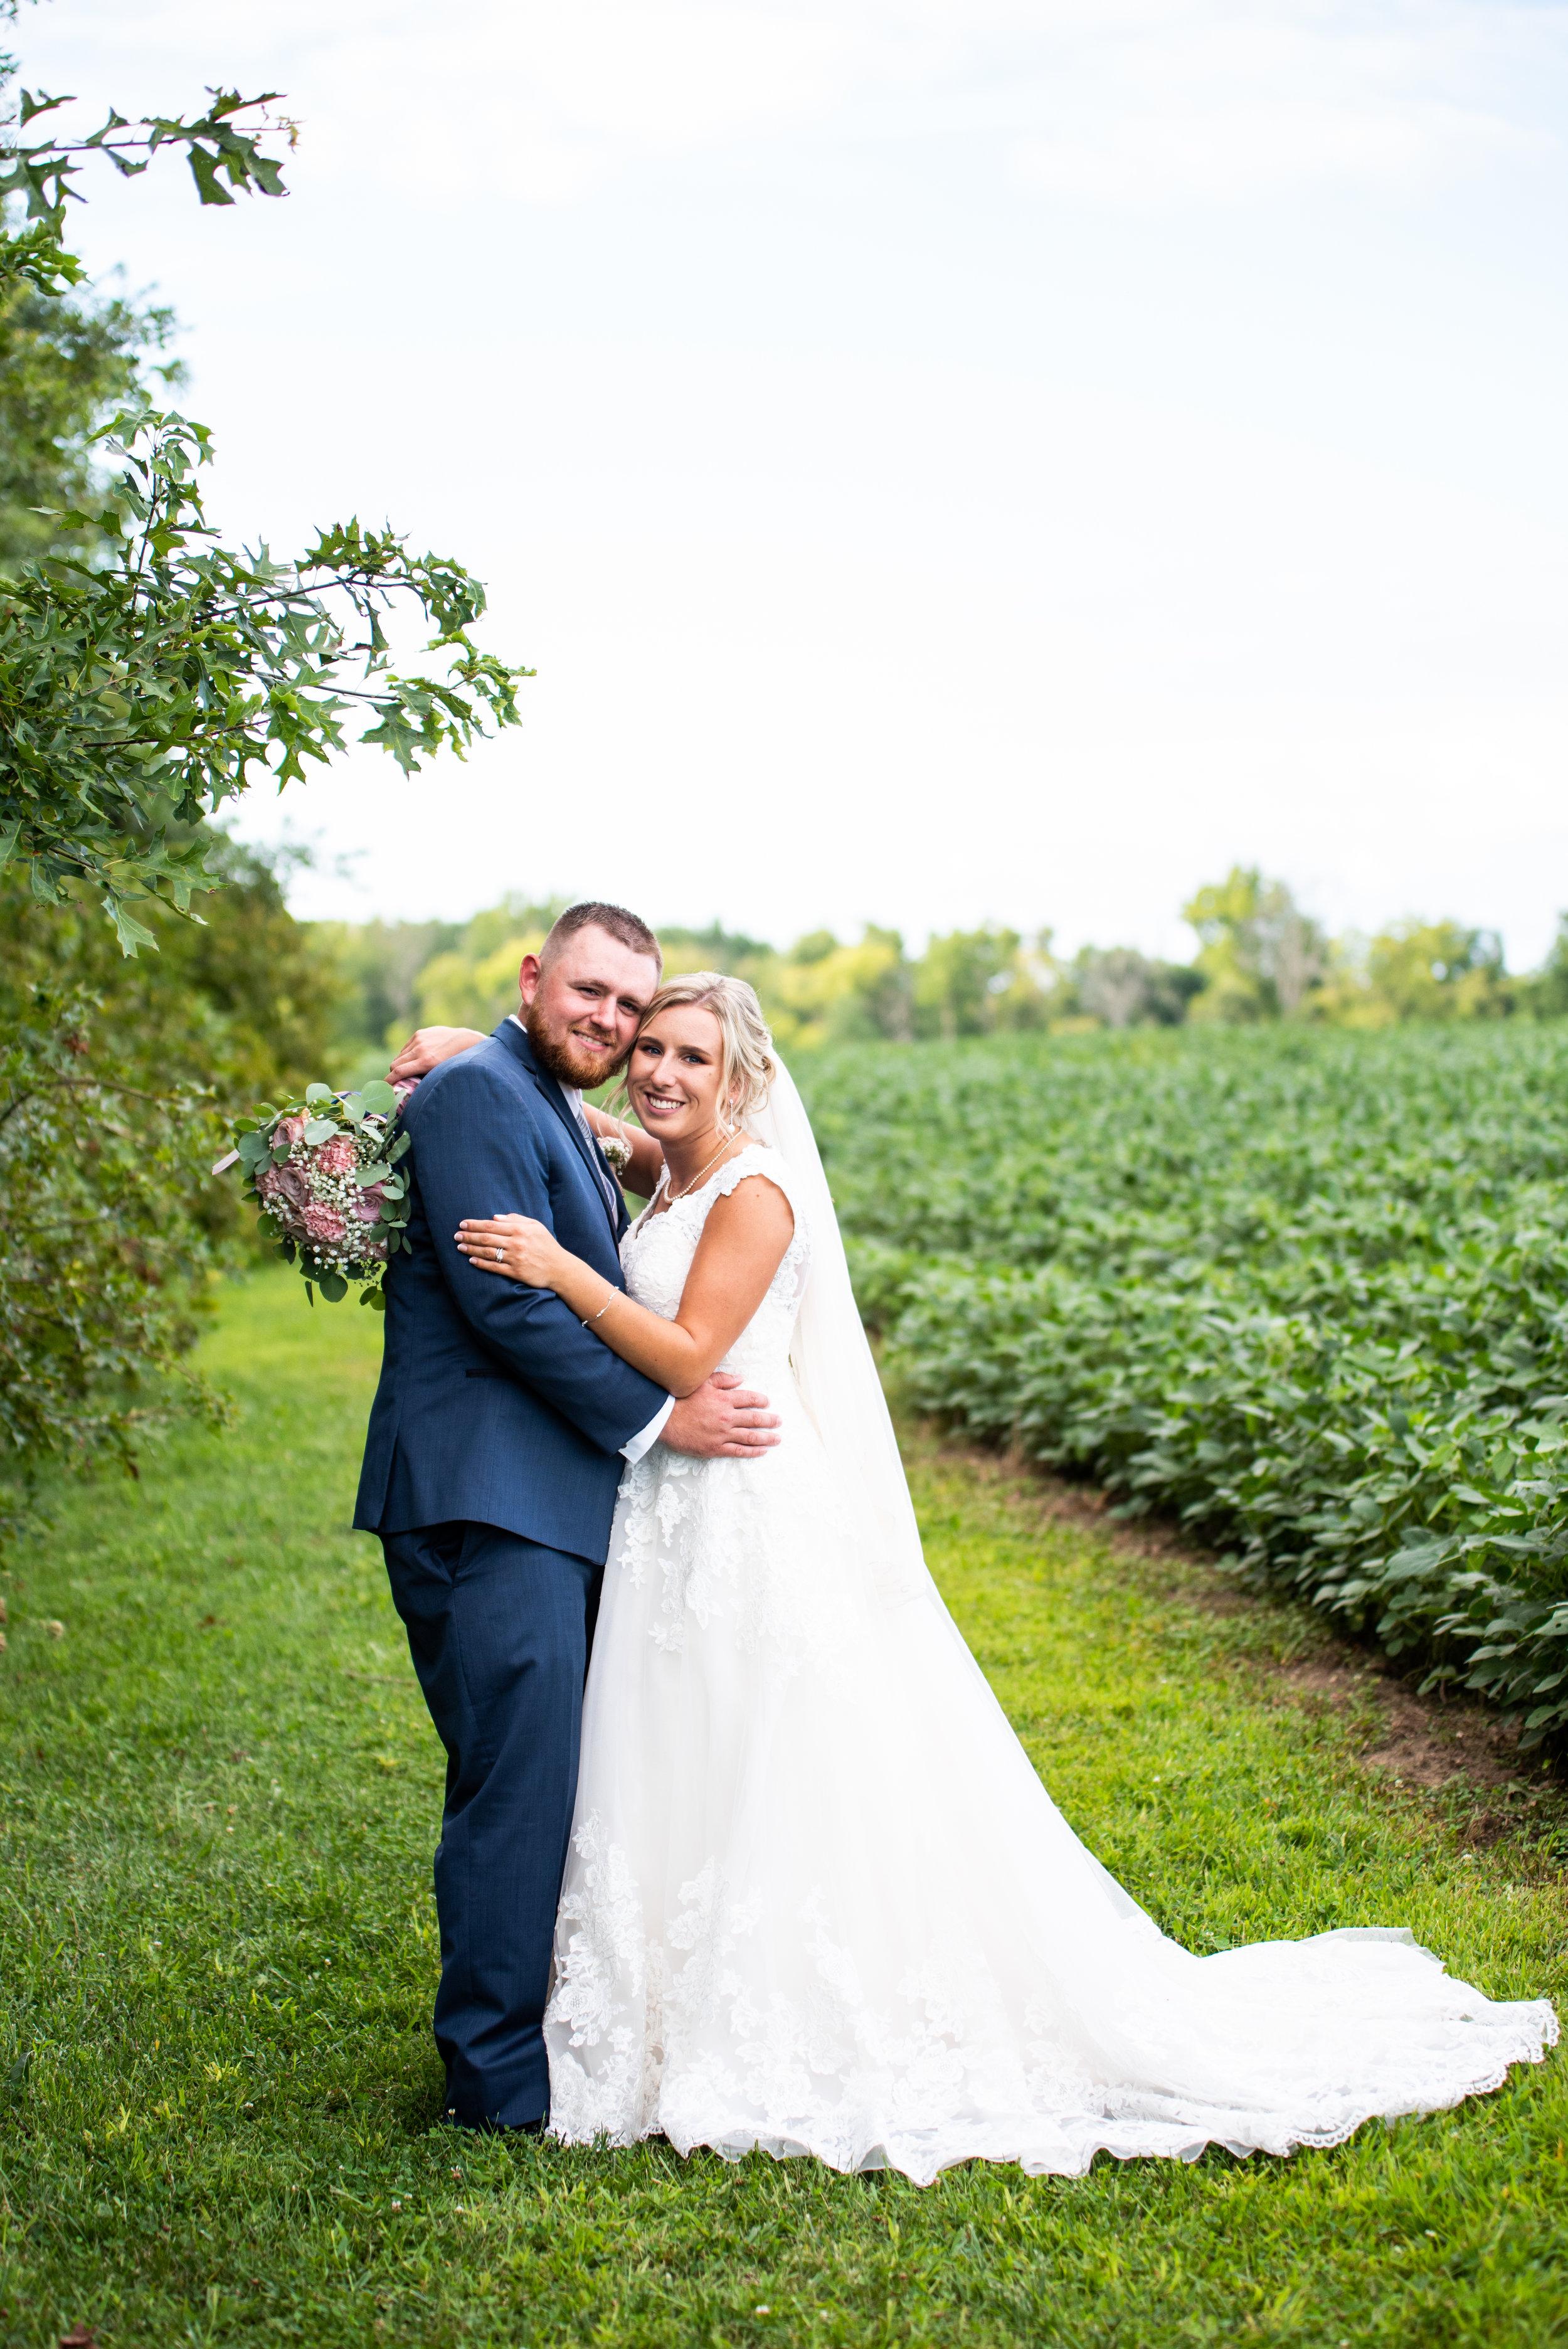 wedding (1 of 1)-146.jpg